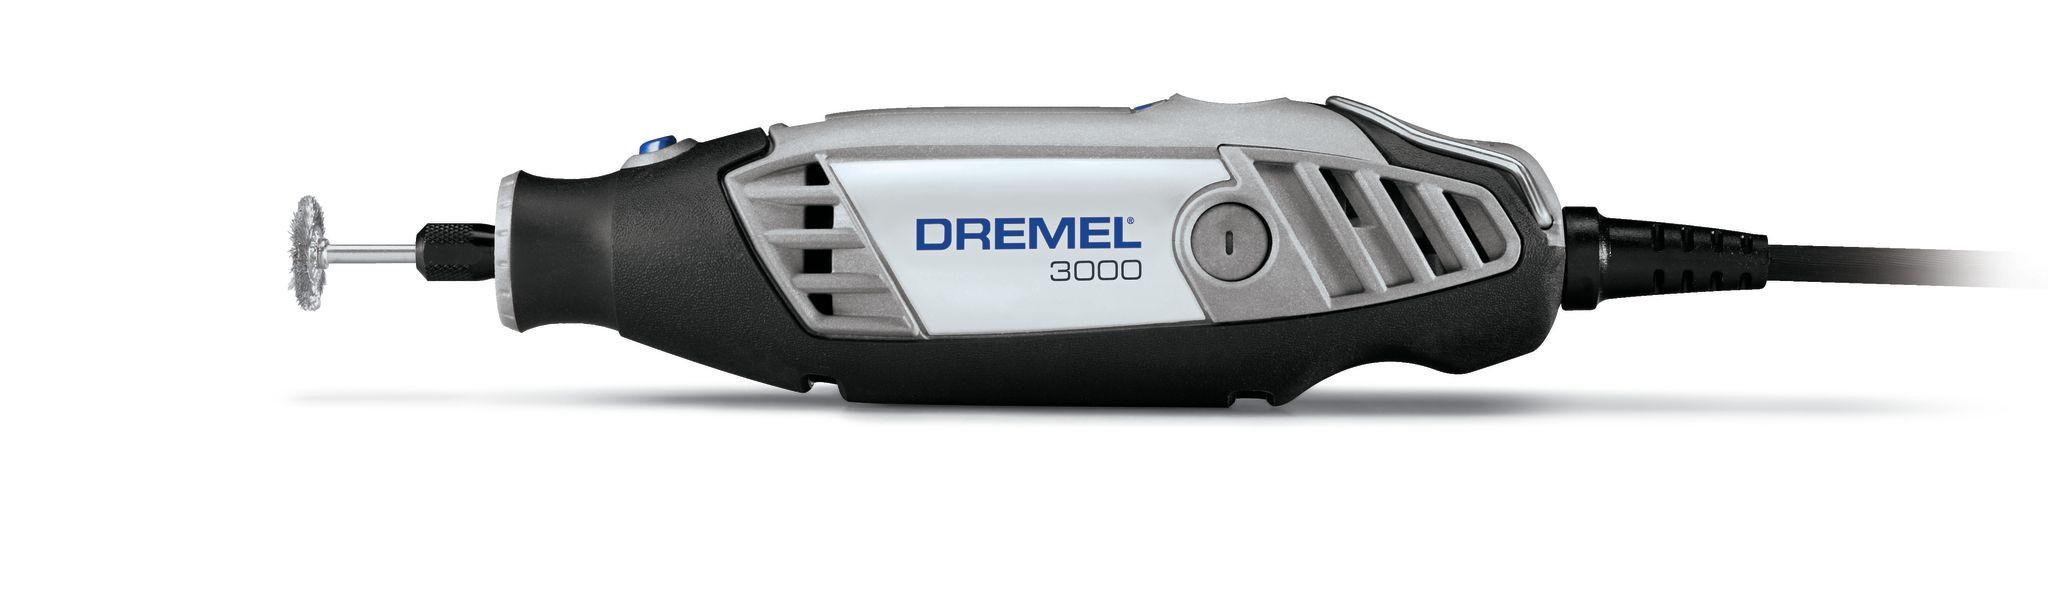 MINITORNO DREMEL 3000 26 ACCESORIOS + ACOPLE